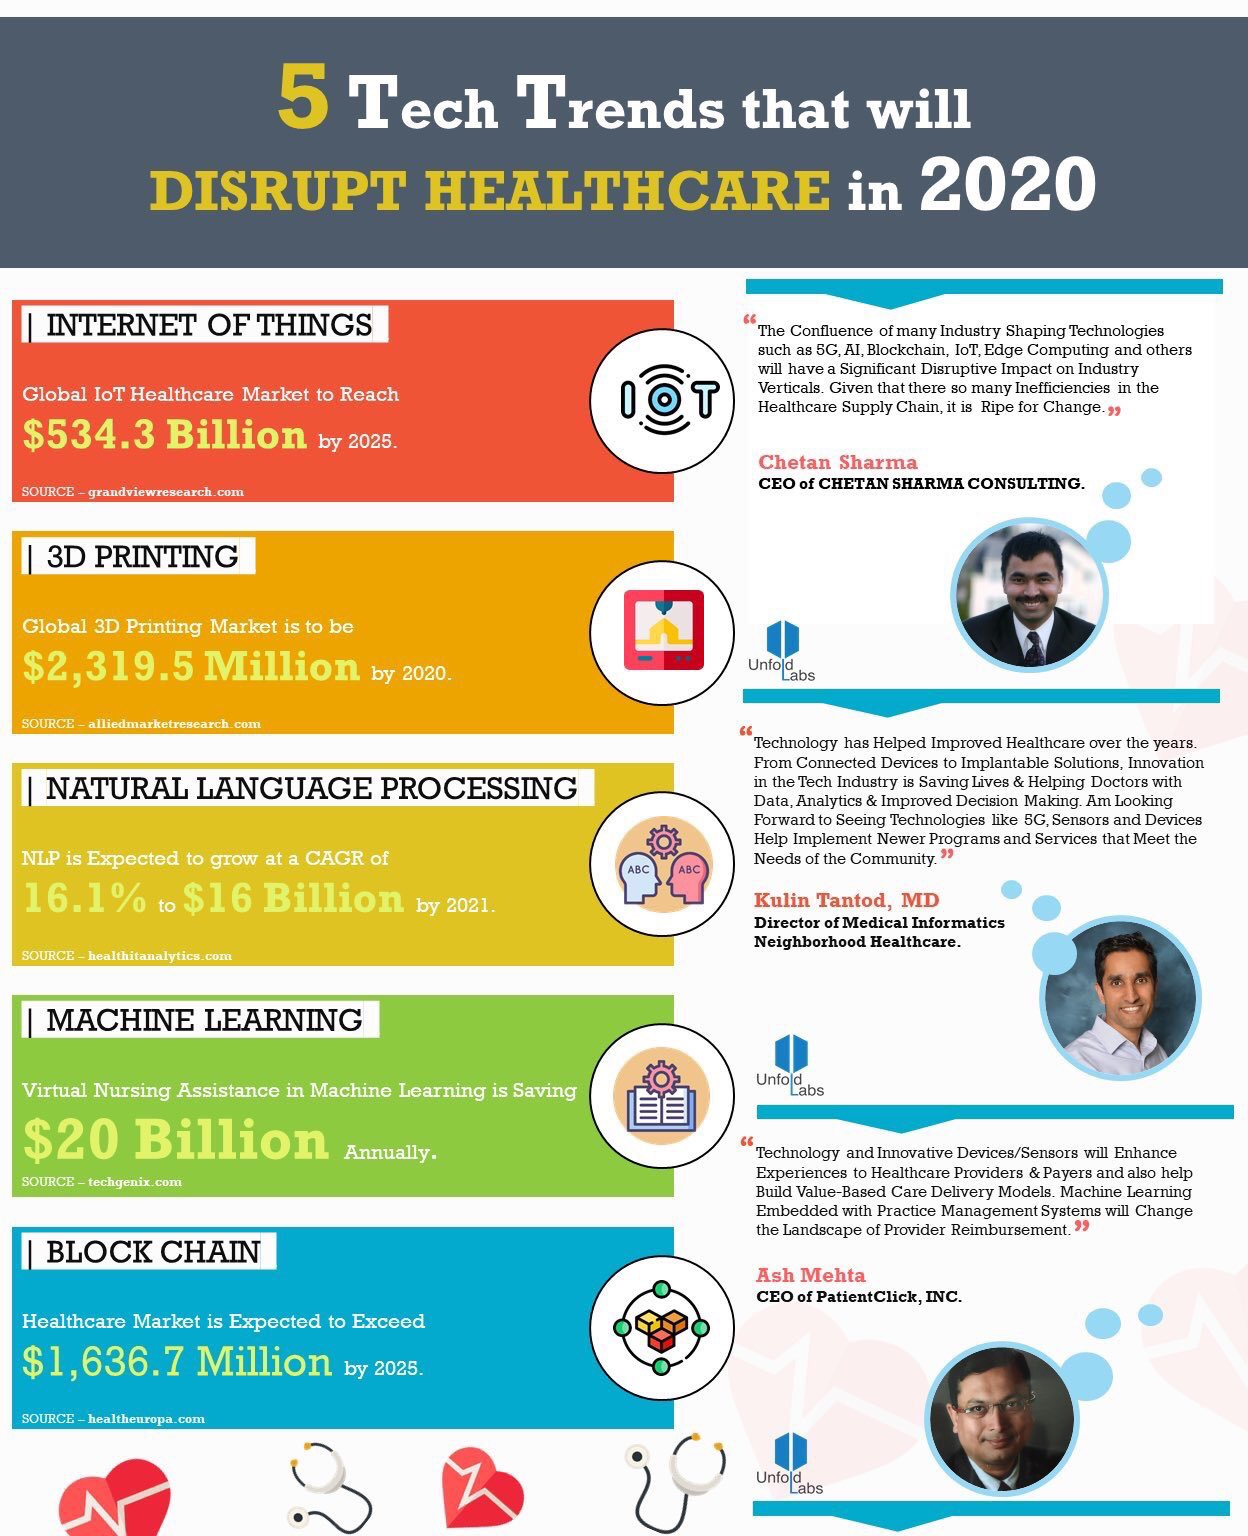 2020 Tech Trends.Ian Jones On Twitter Five Tech Trends That Will Disrupt